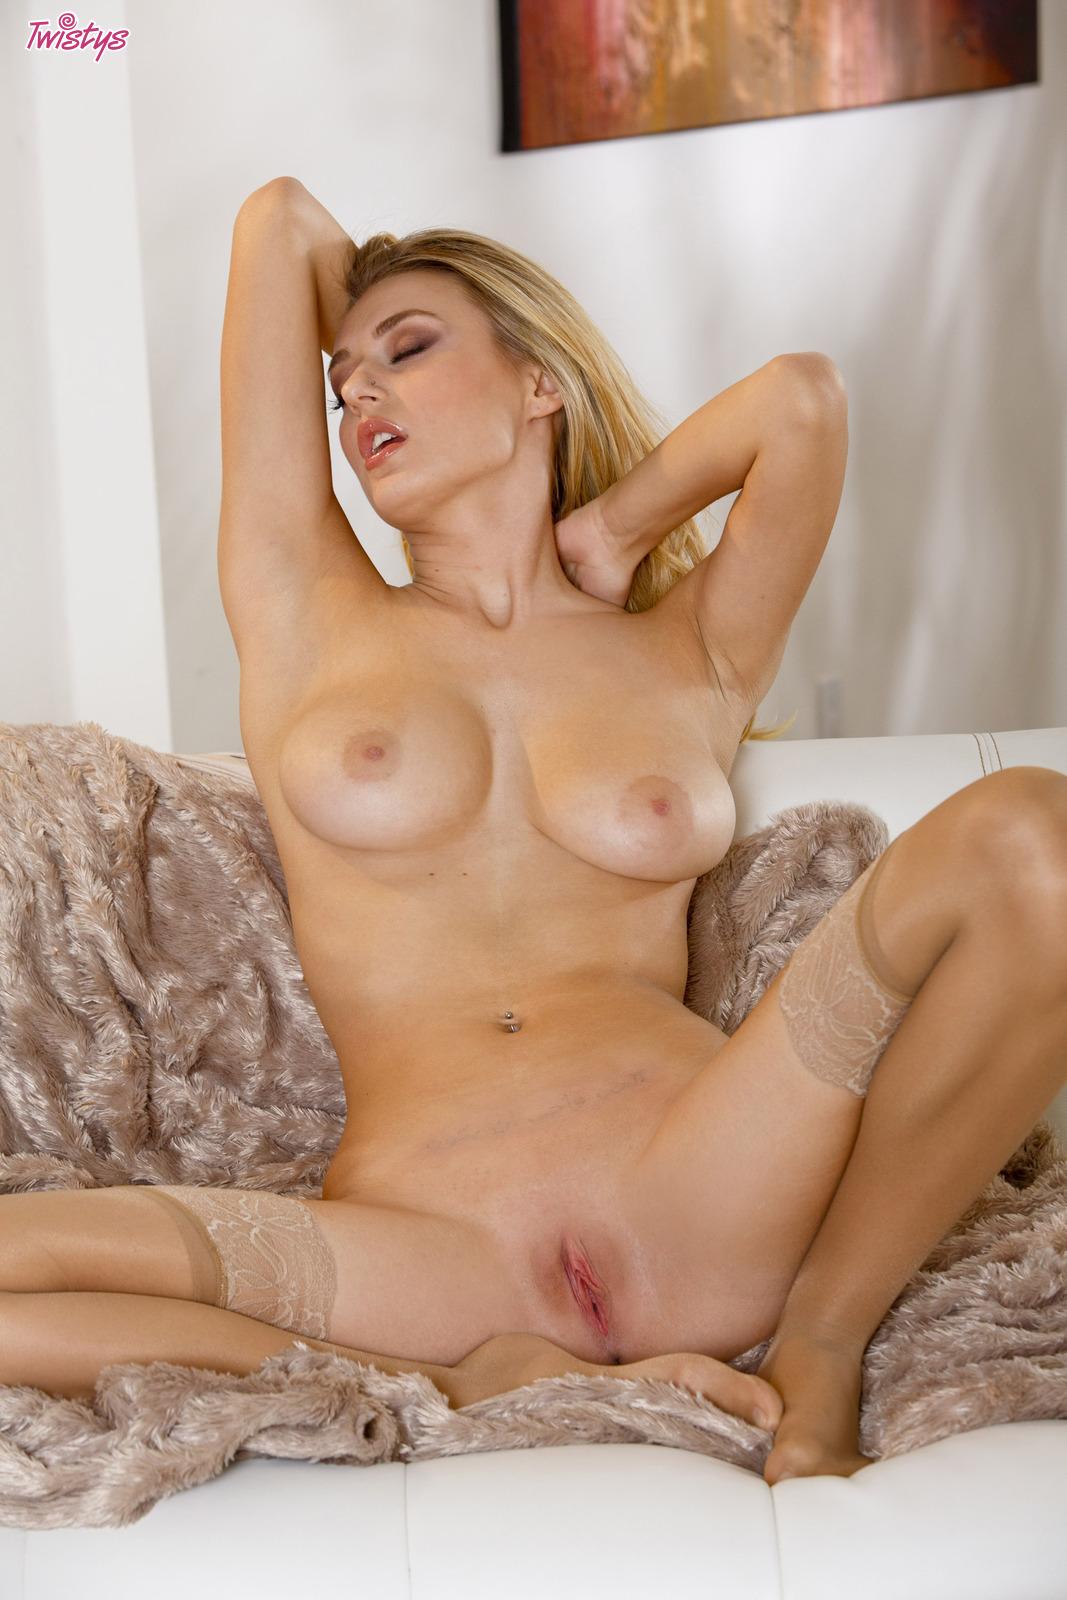 Nude Blonde Twistys